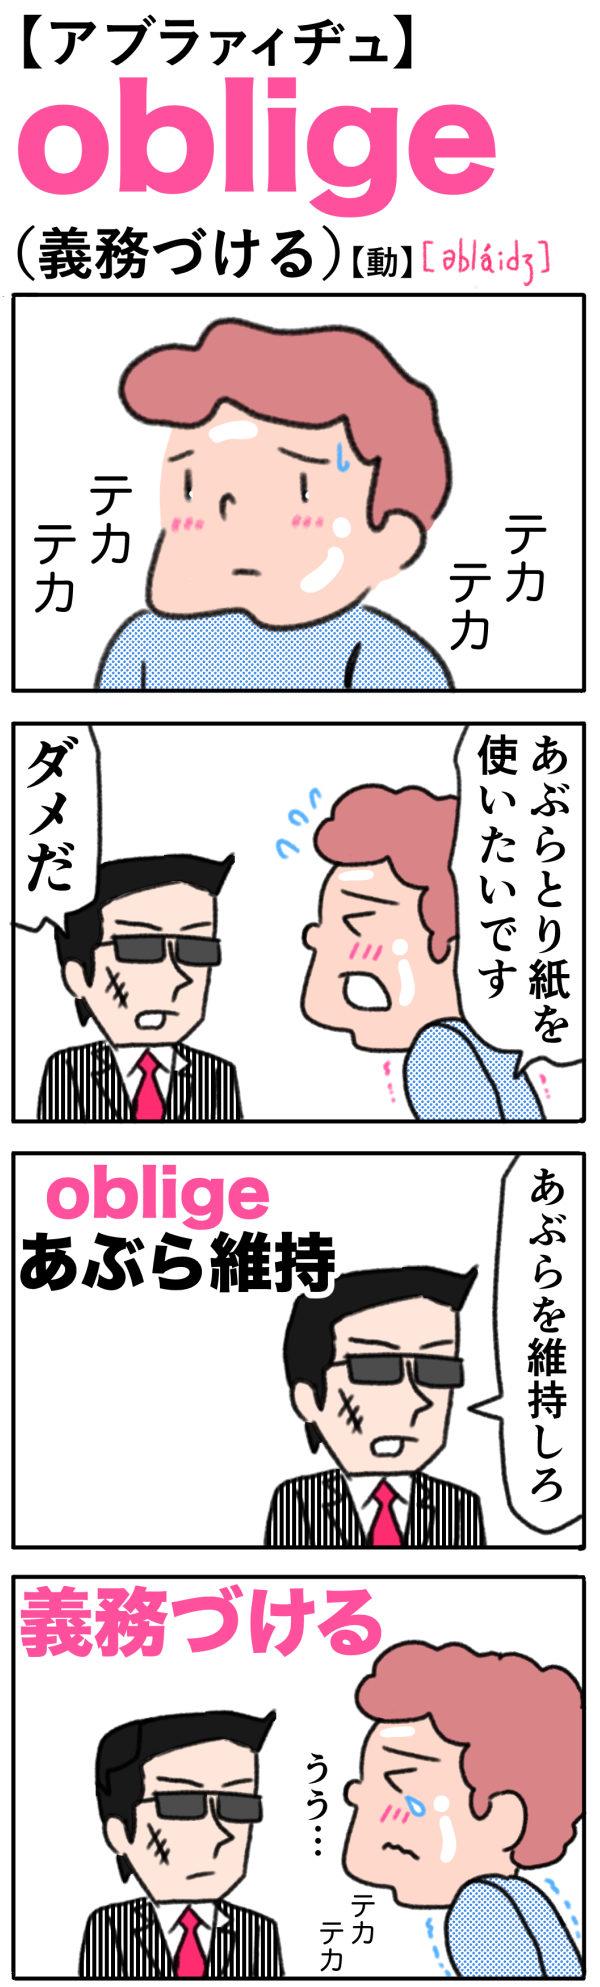 oblige(義務づける)の語呂合わせ英単語